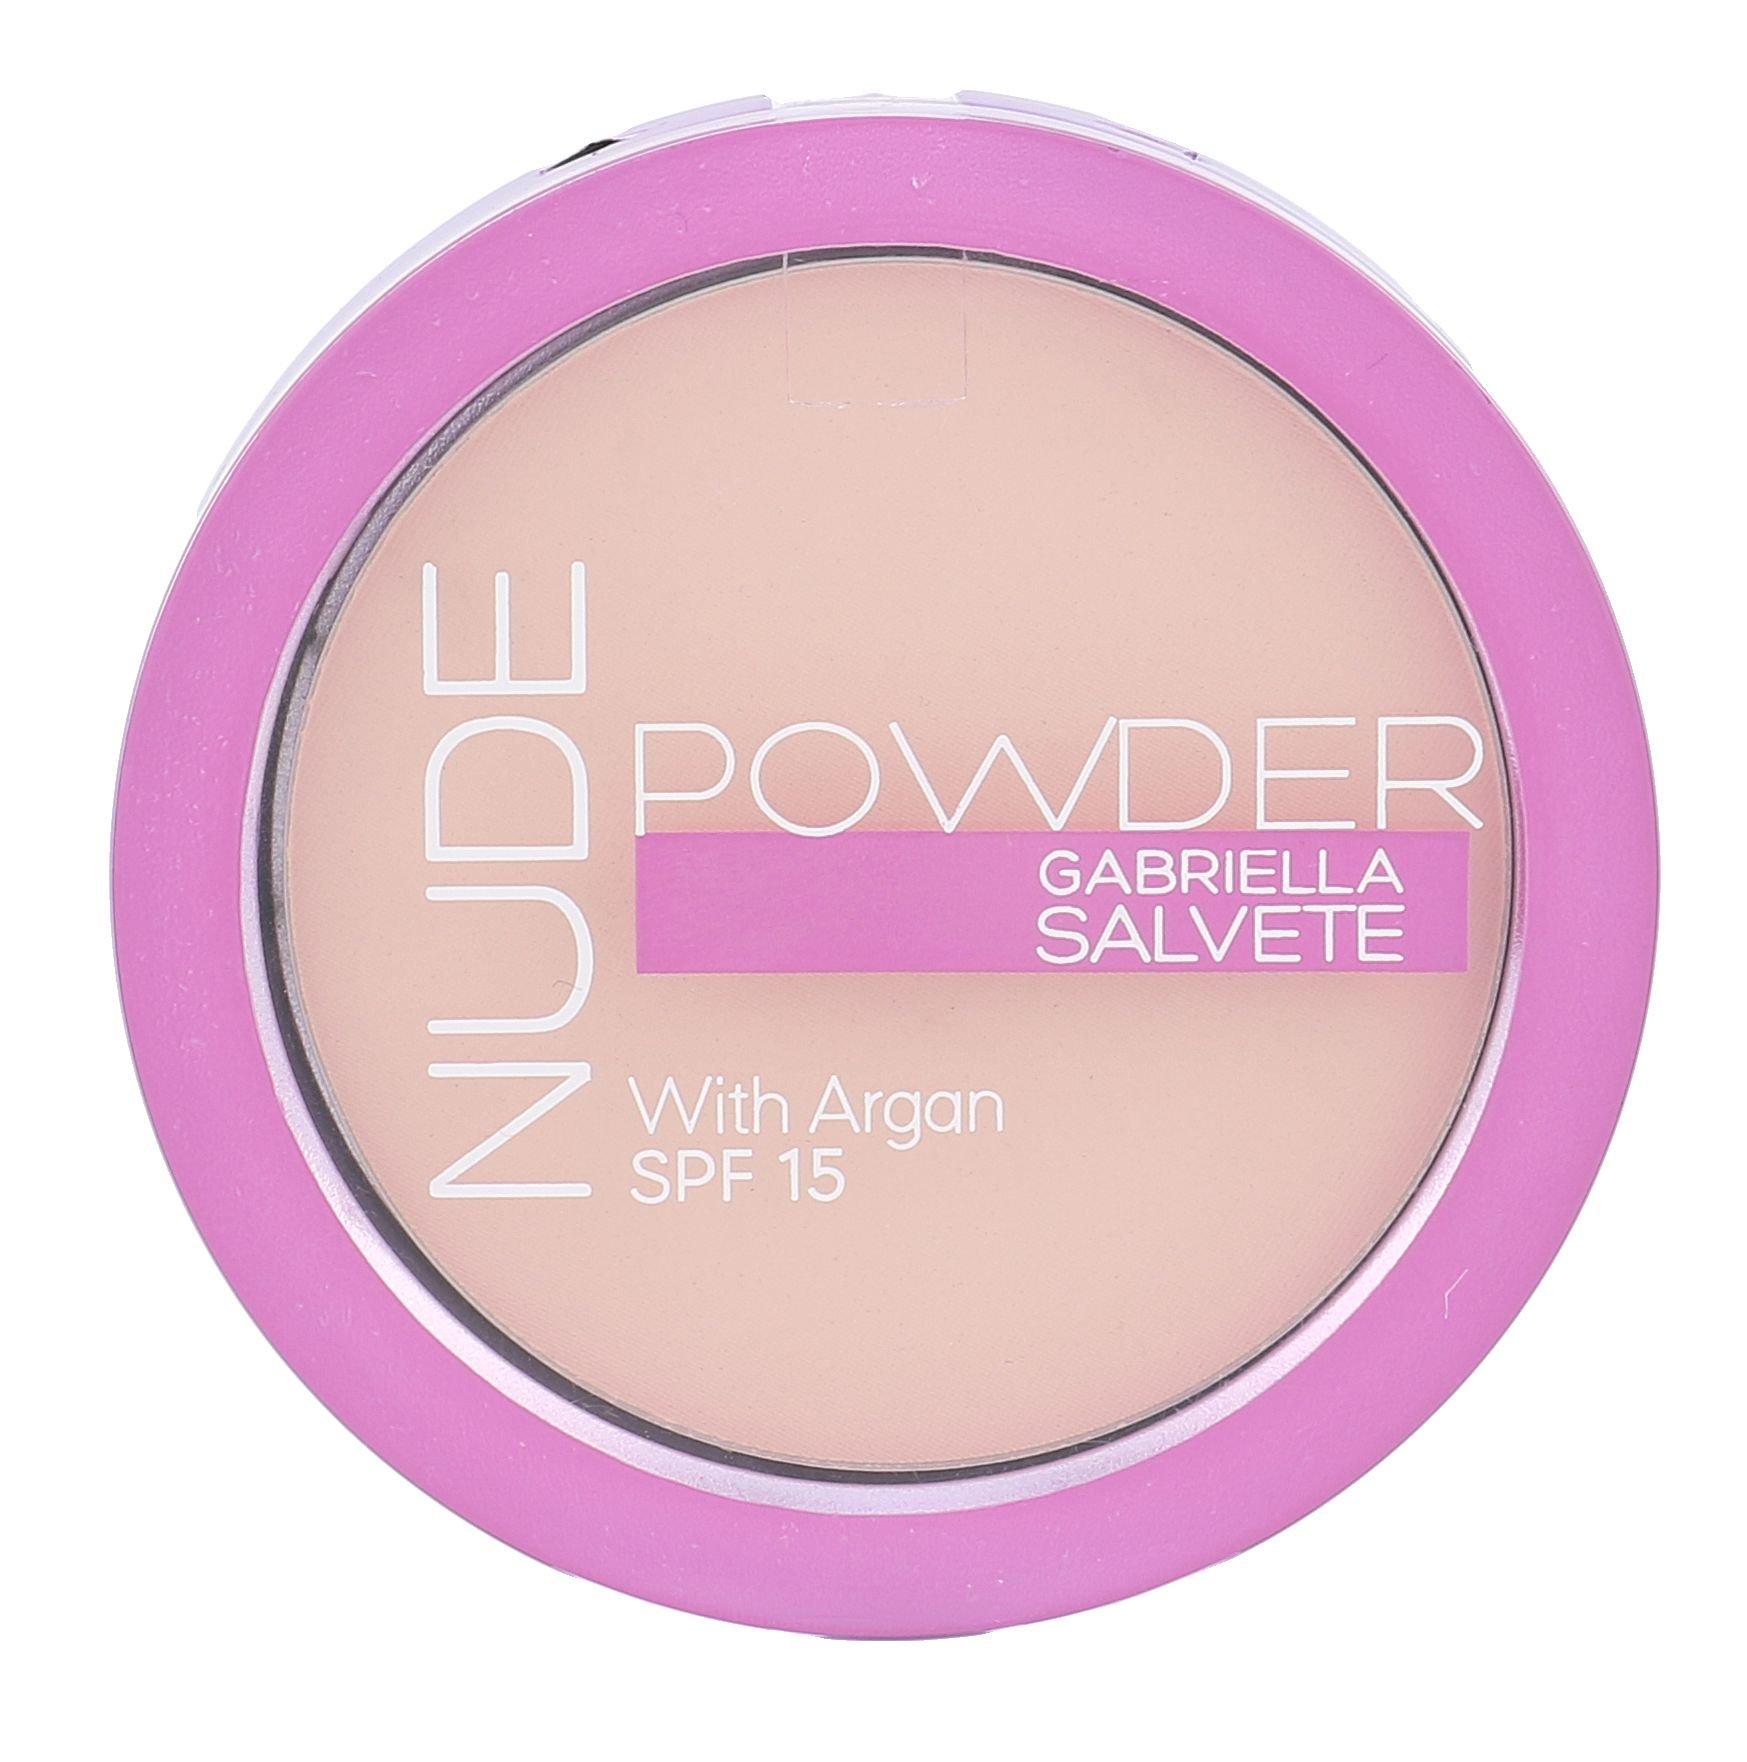 Gabriella Salvete Nude Powder SPF15 Cosmetic 8g 02 Light Nude